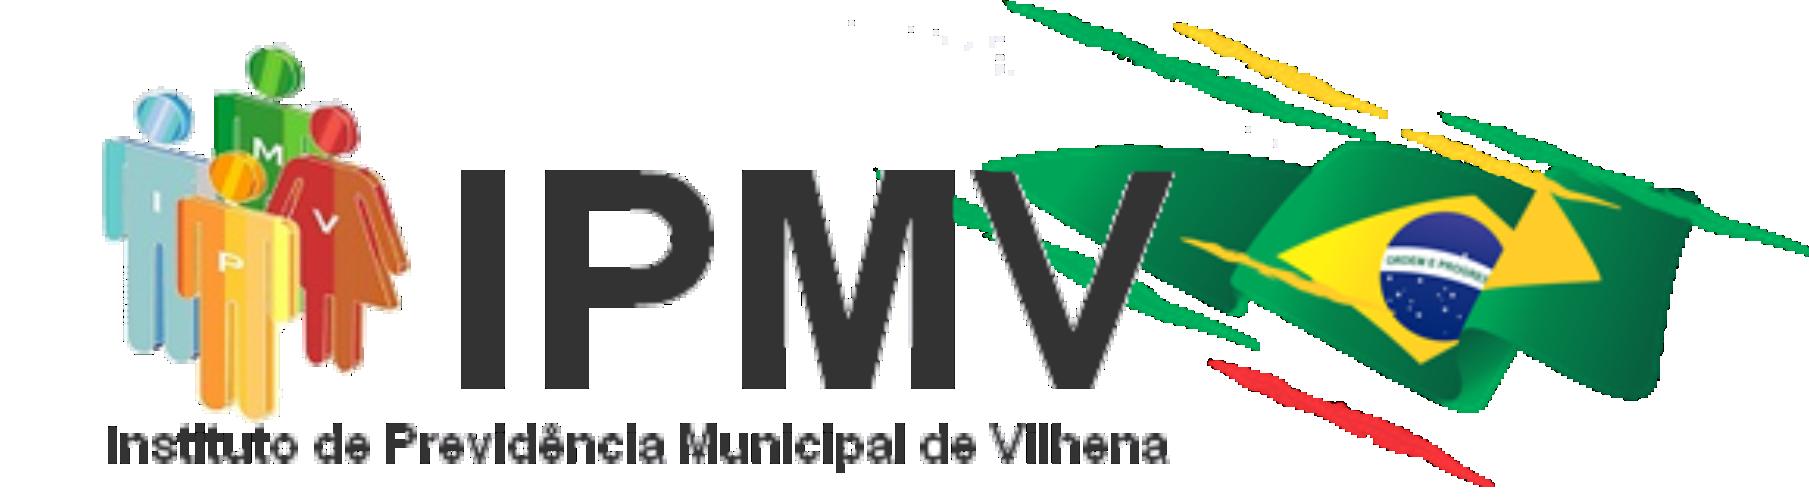 IPMV - Instituto da Previdência Municipal de Vilhena | IPMV Vilhena